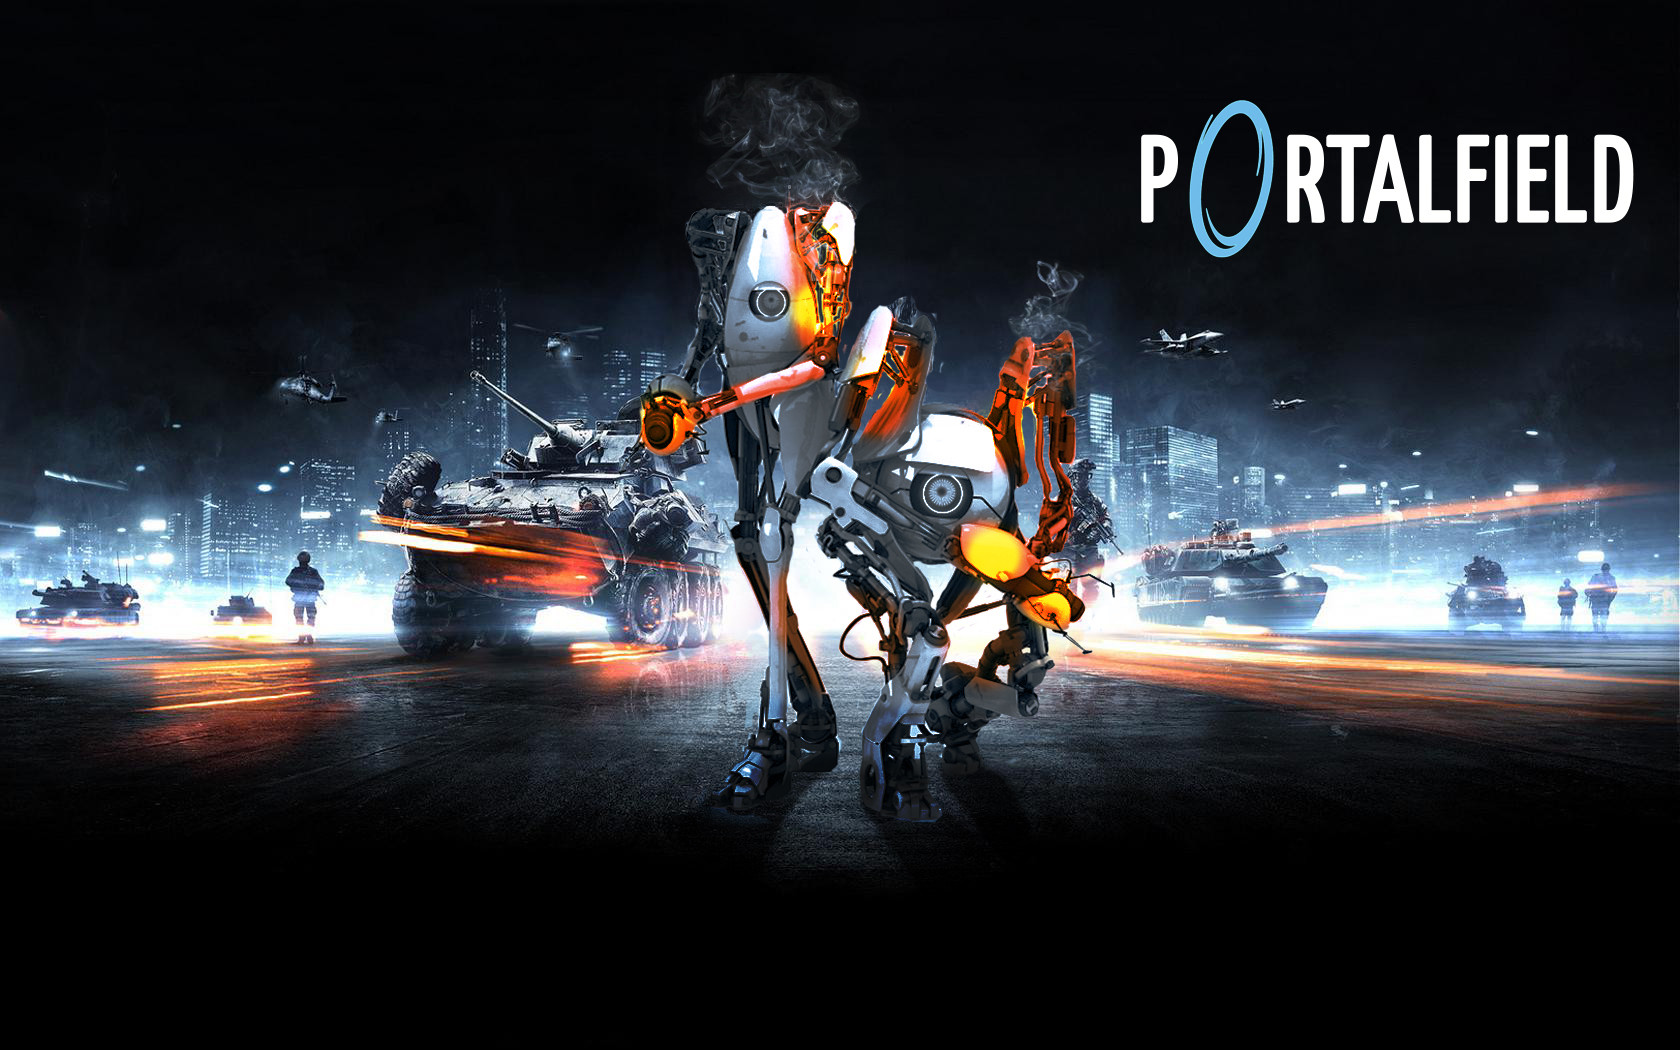 4k Gaming Wallpaper Reddit - Battlefield 3 , HD Wallpaper & Backgrounds